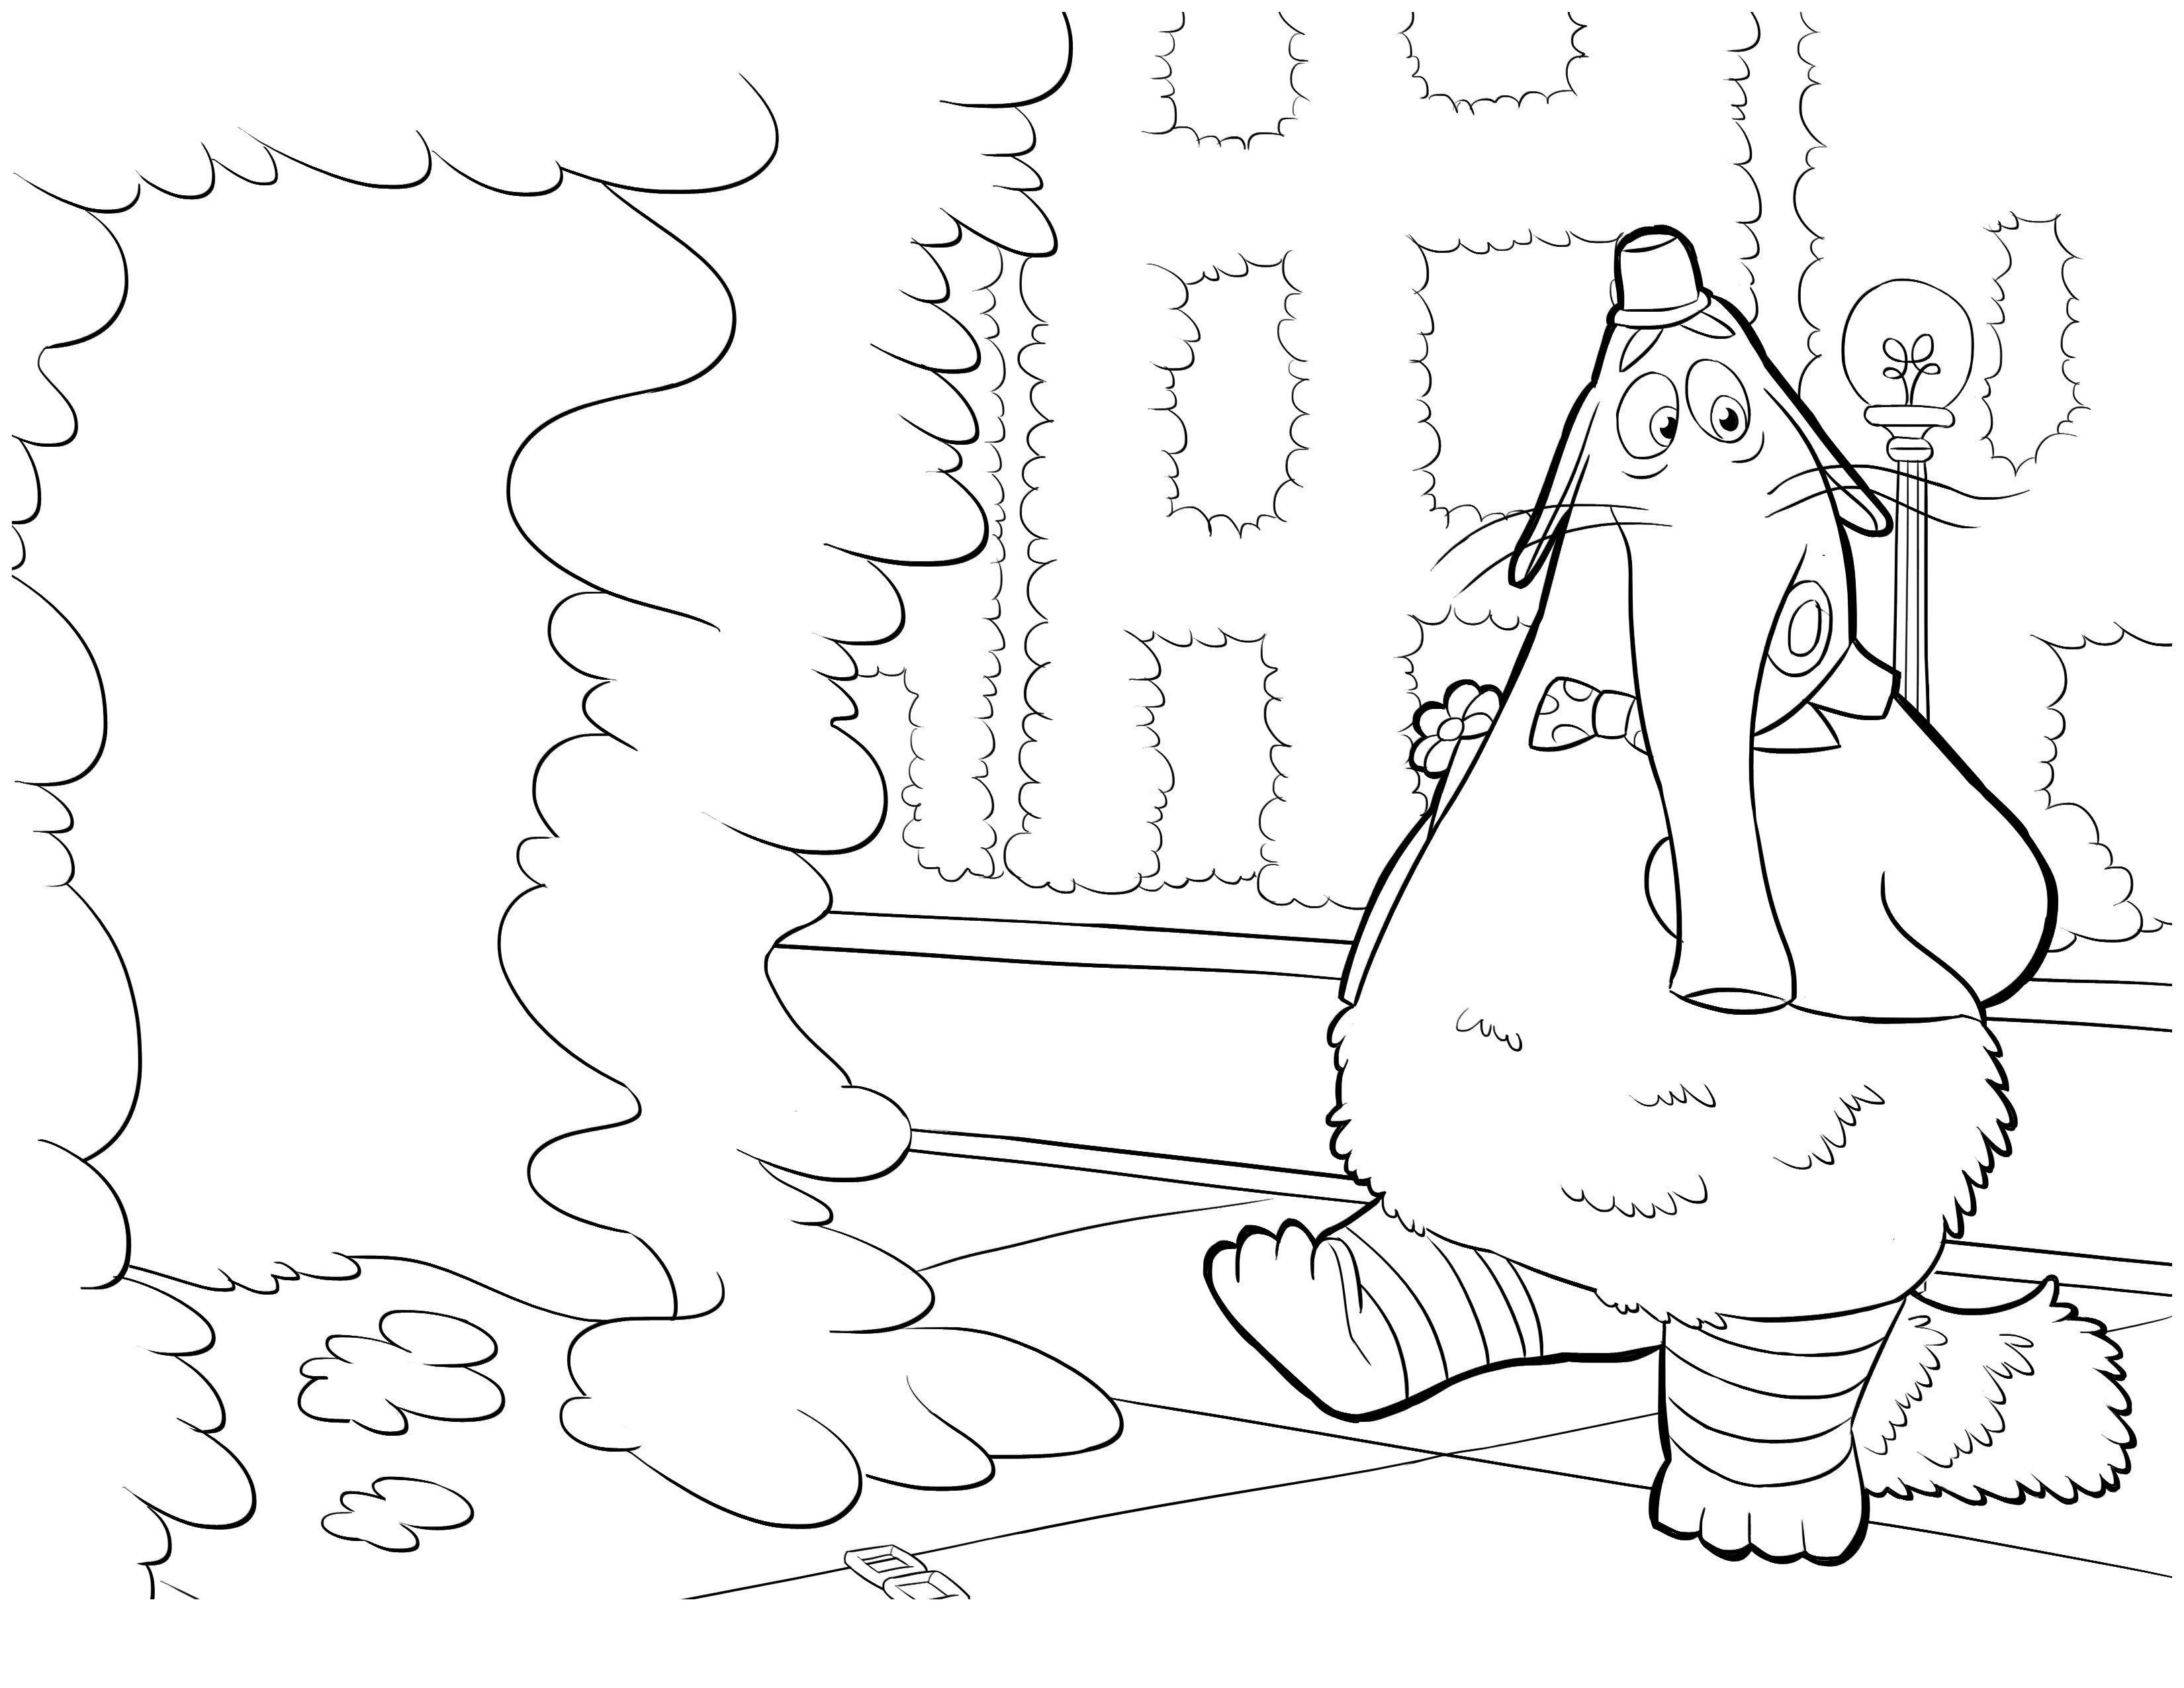 Картинка для раскраски «Бинго-Бонго»